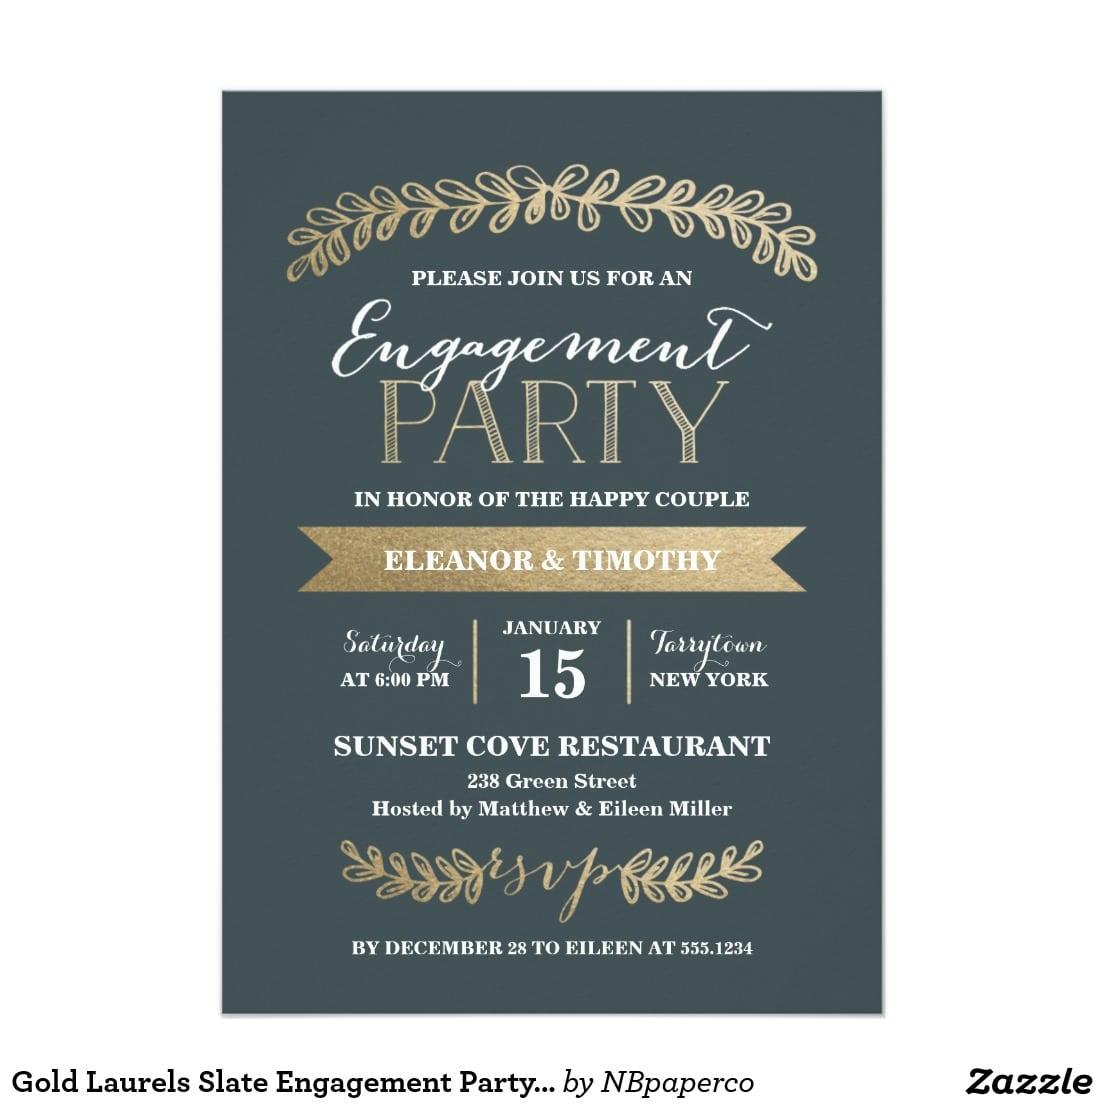 Gold Laurels Slate Engagement Party Invitation